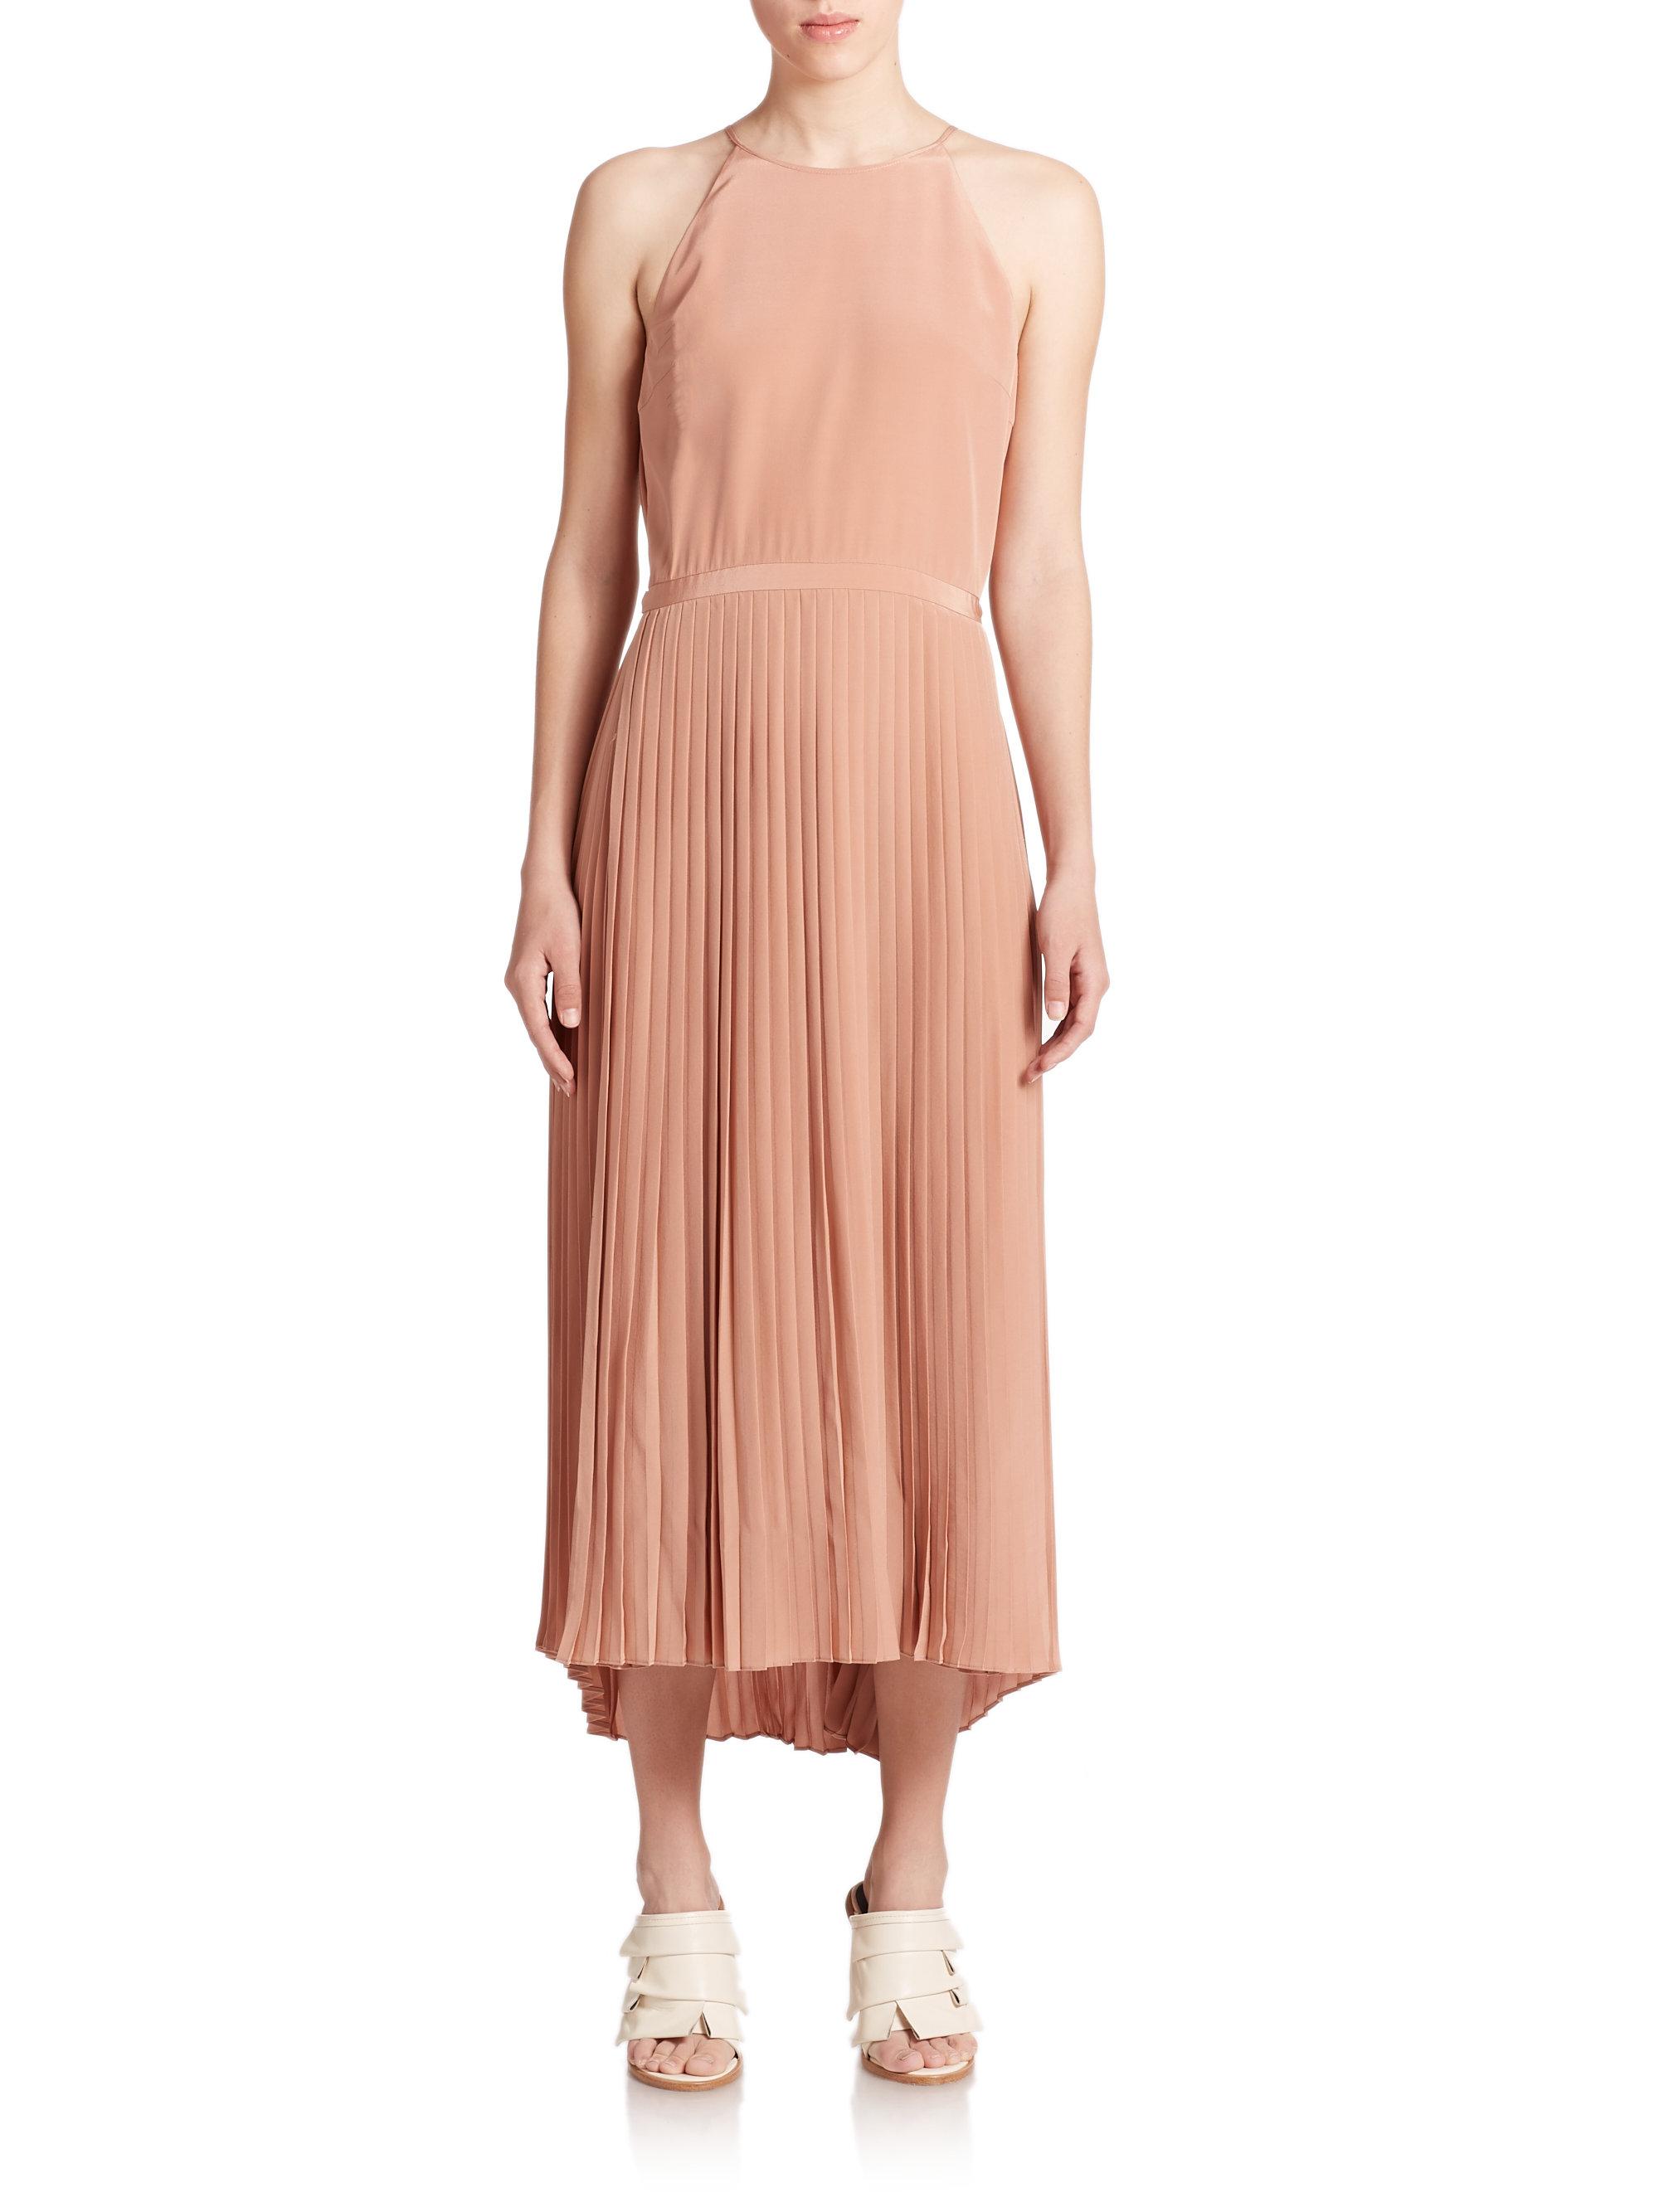 Tibi silk halter maxi dress